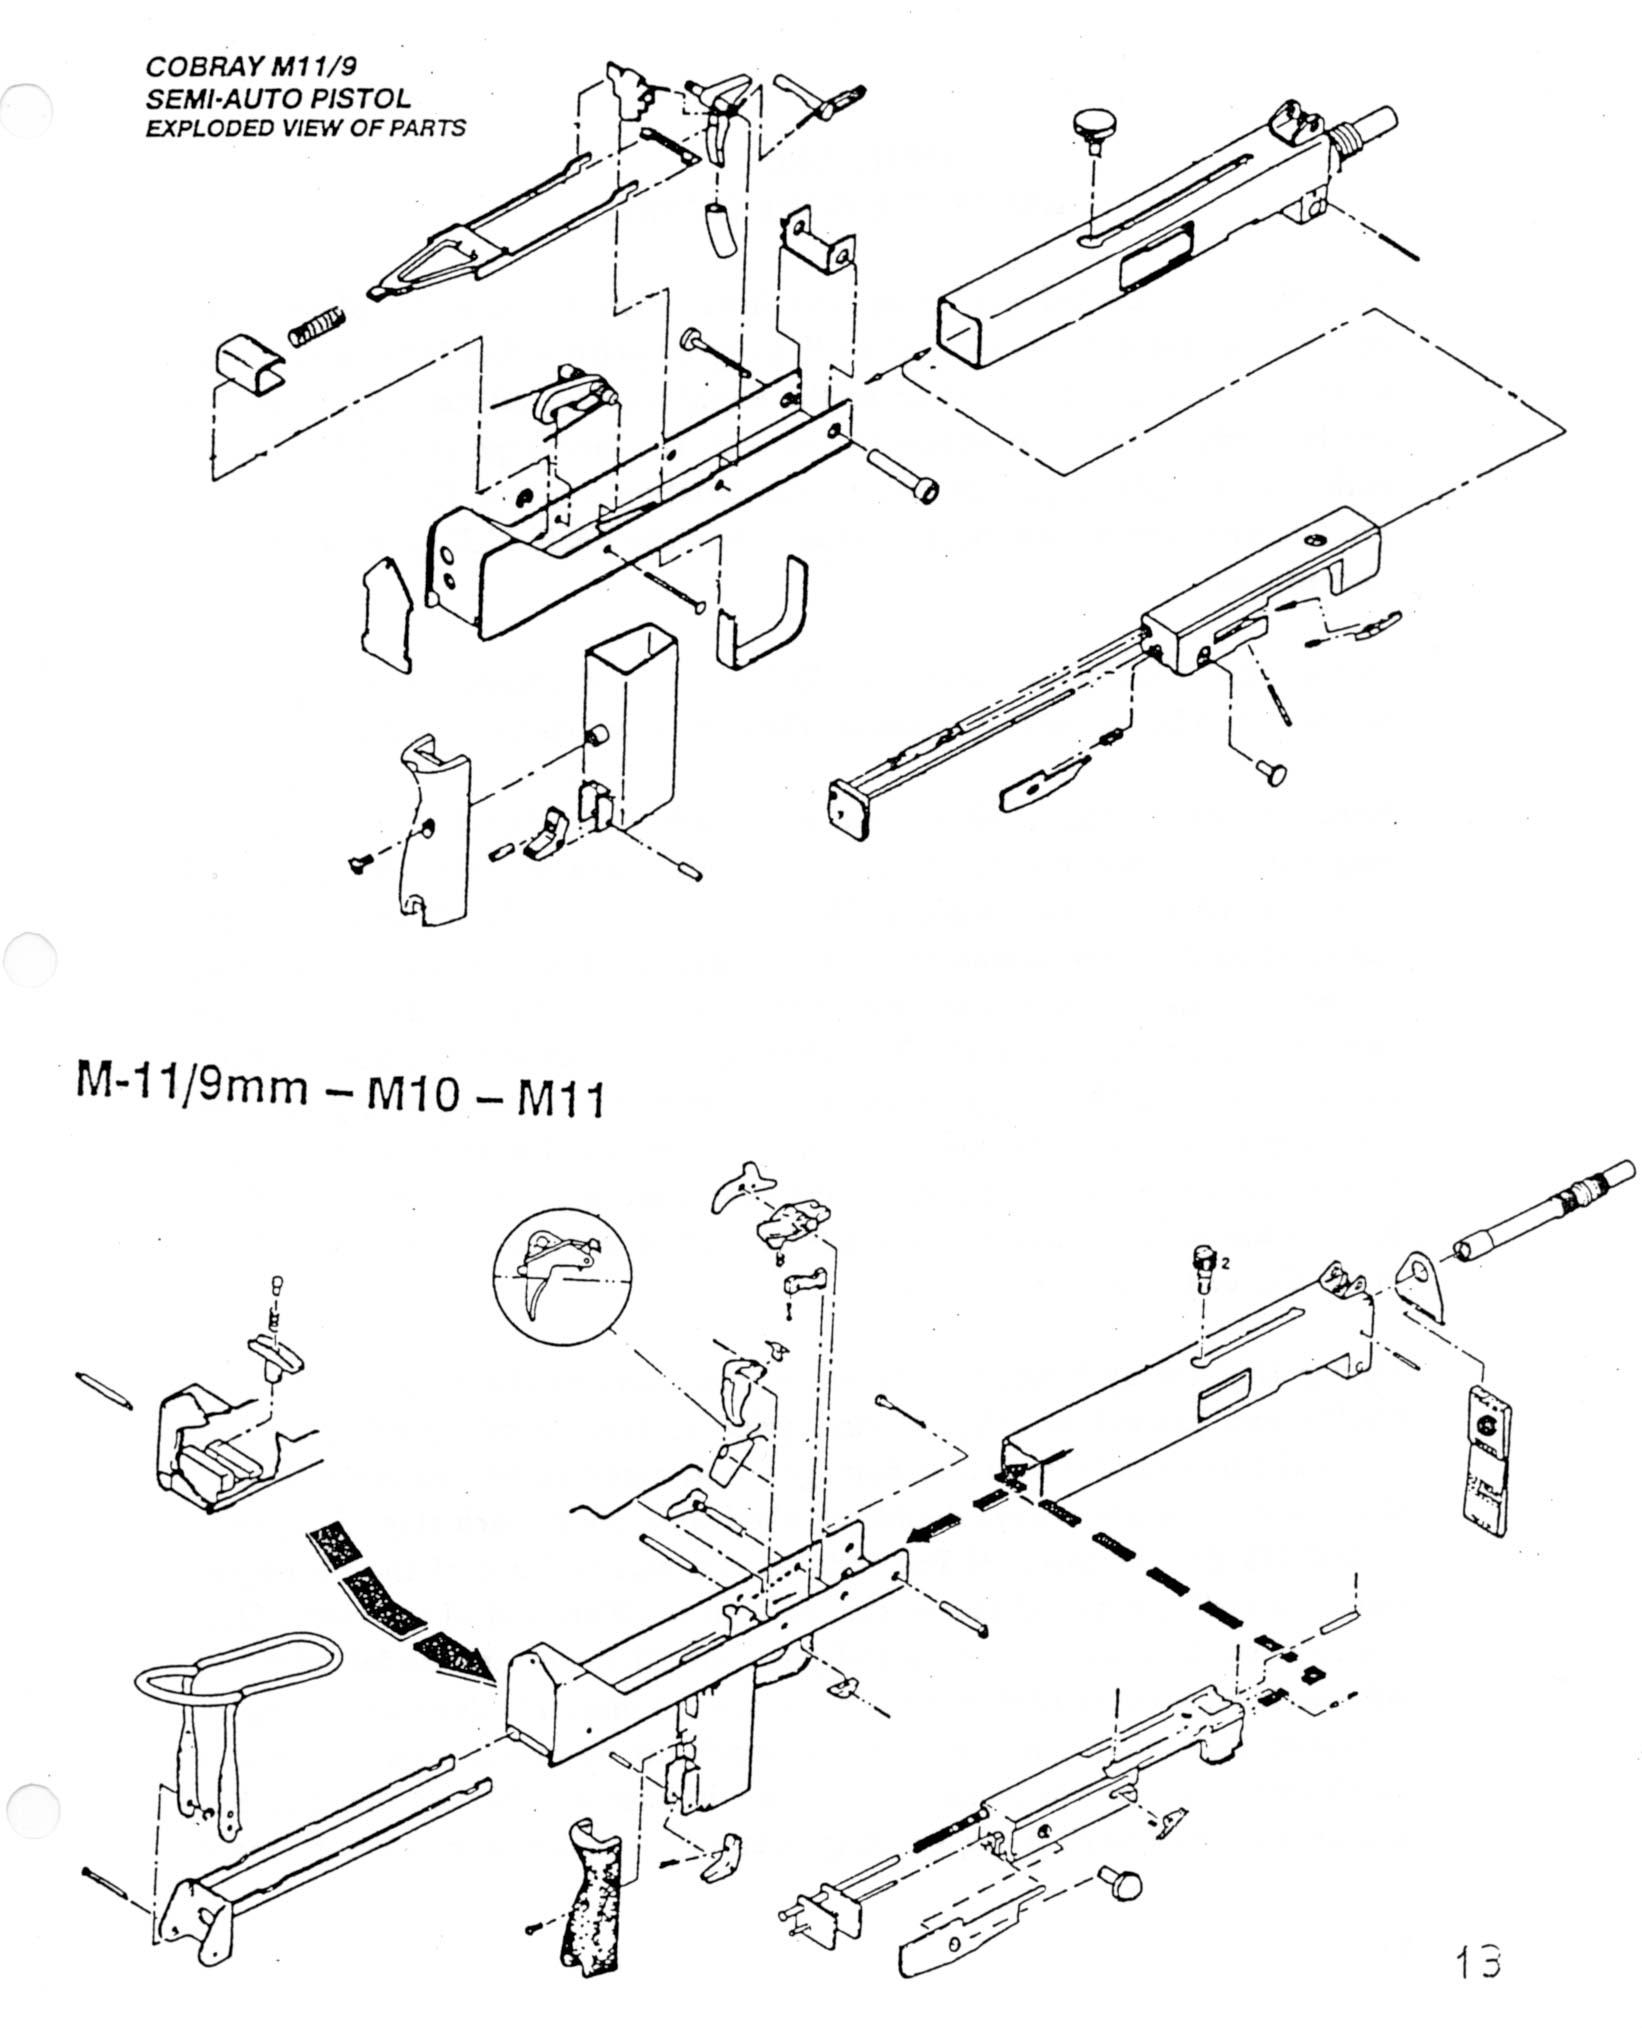 Cobray m11 diagram info wiring m111 cobray m11 diagramhtml